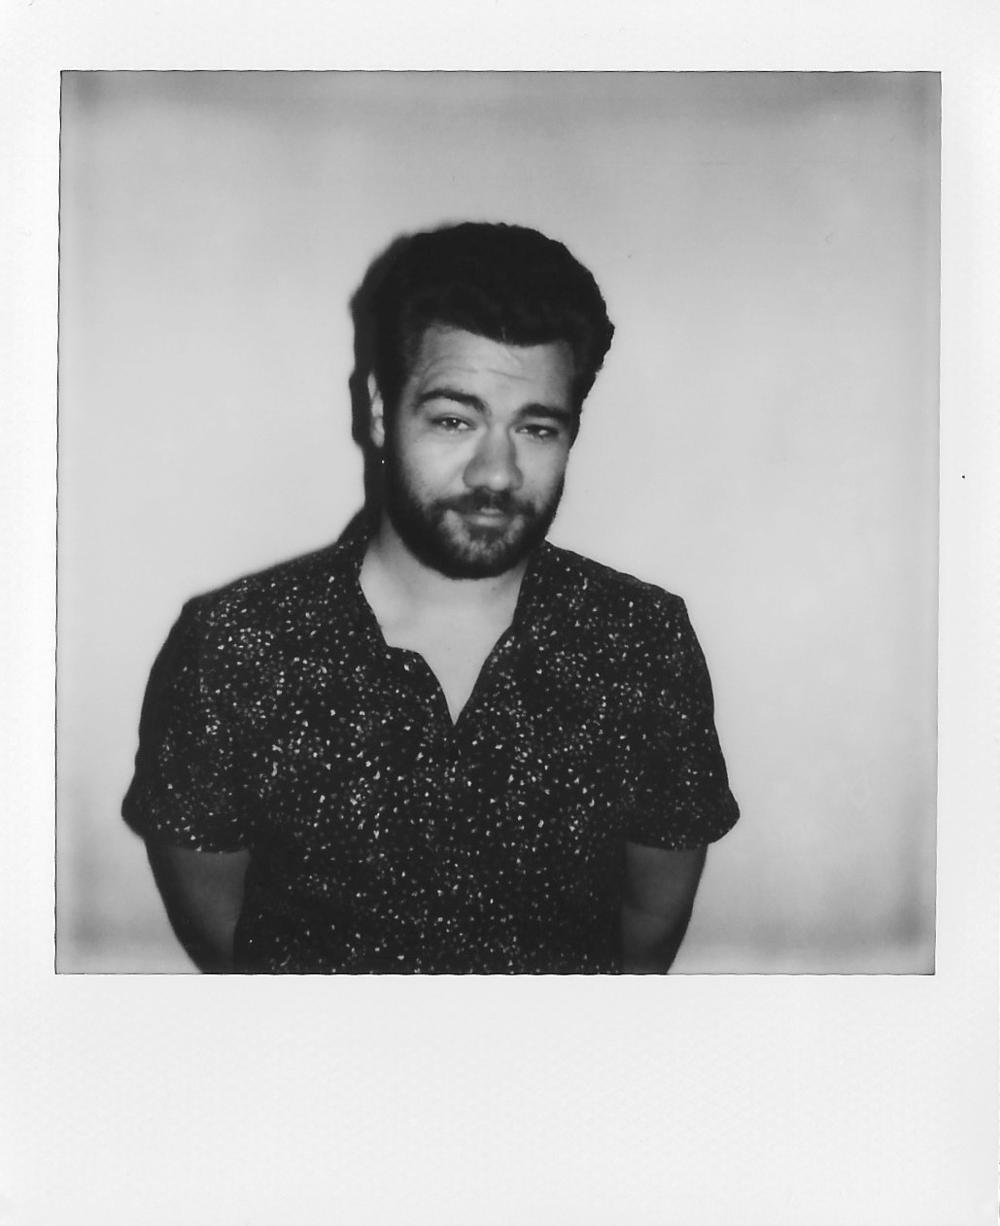 craig harmer - Director of Photography | WriterGo to Craig's website ➝